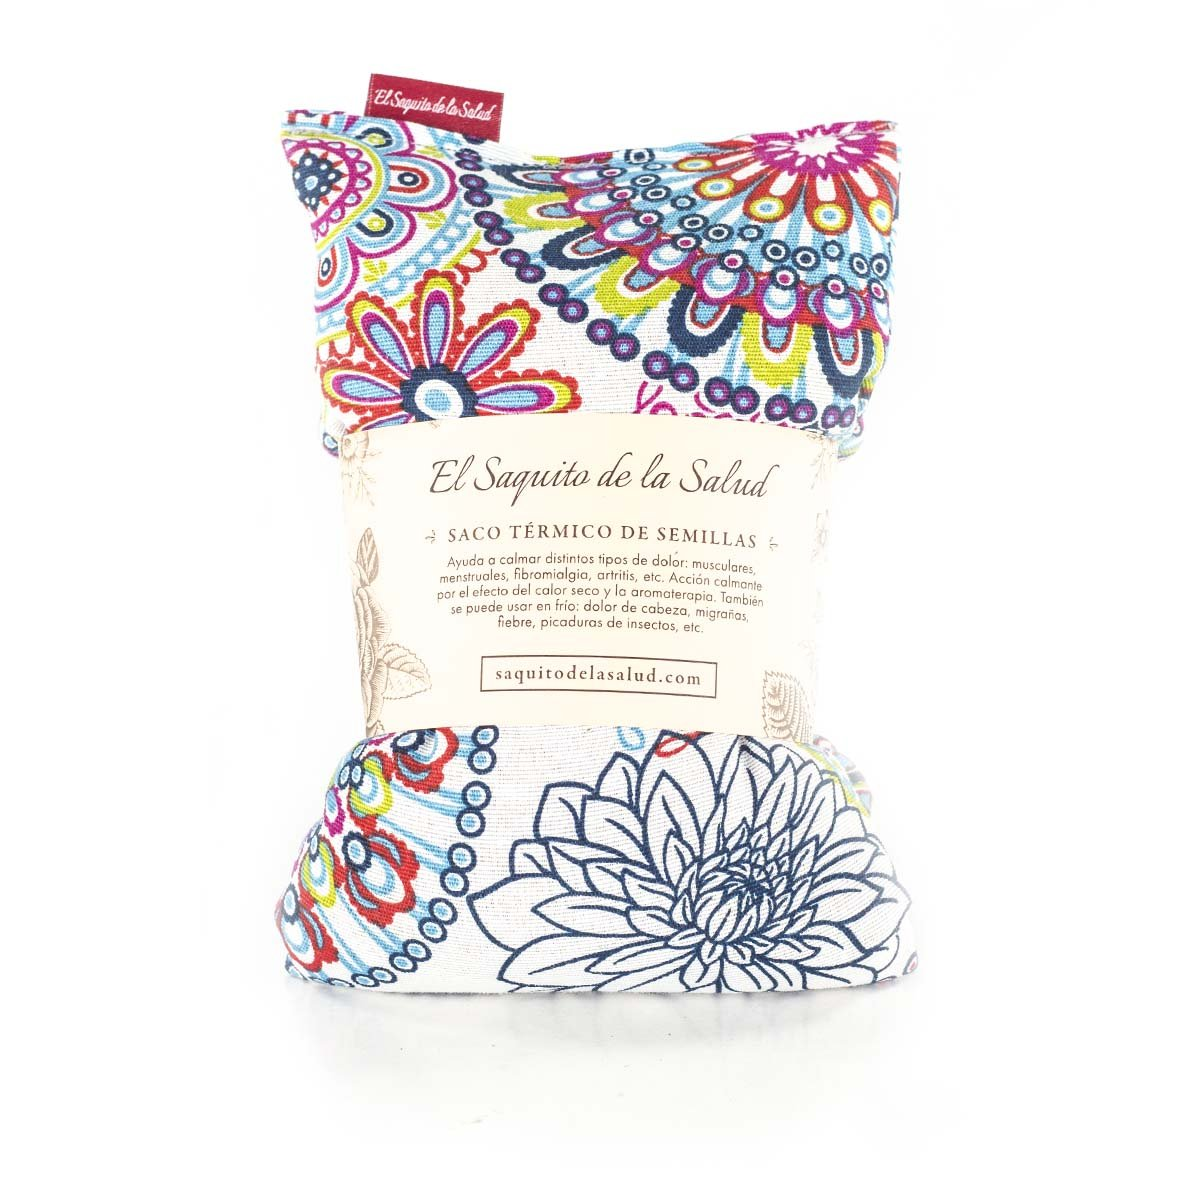 Saco Térmico de Semillas aroma Lavanda, Azahar o Romero tejido Flores Multicolor (Romero, 26x28x2cm): Amazon.es: Hogar